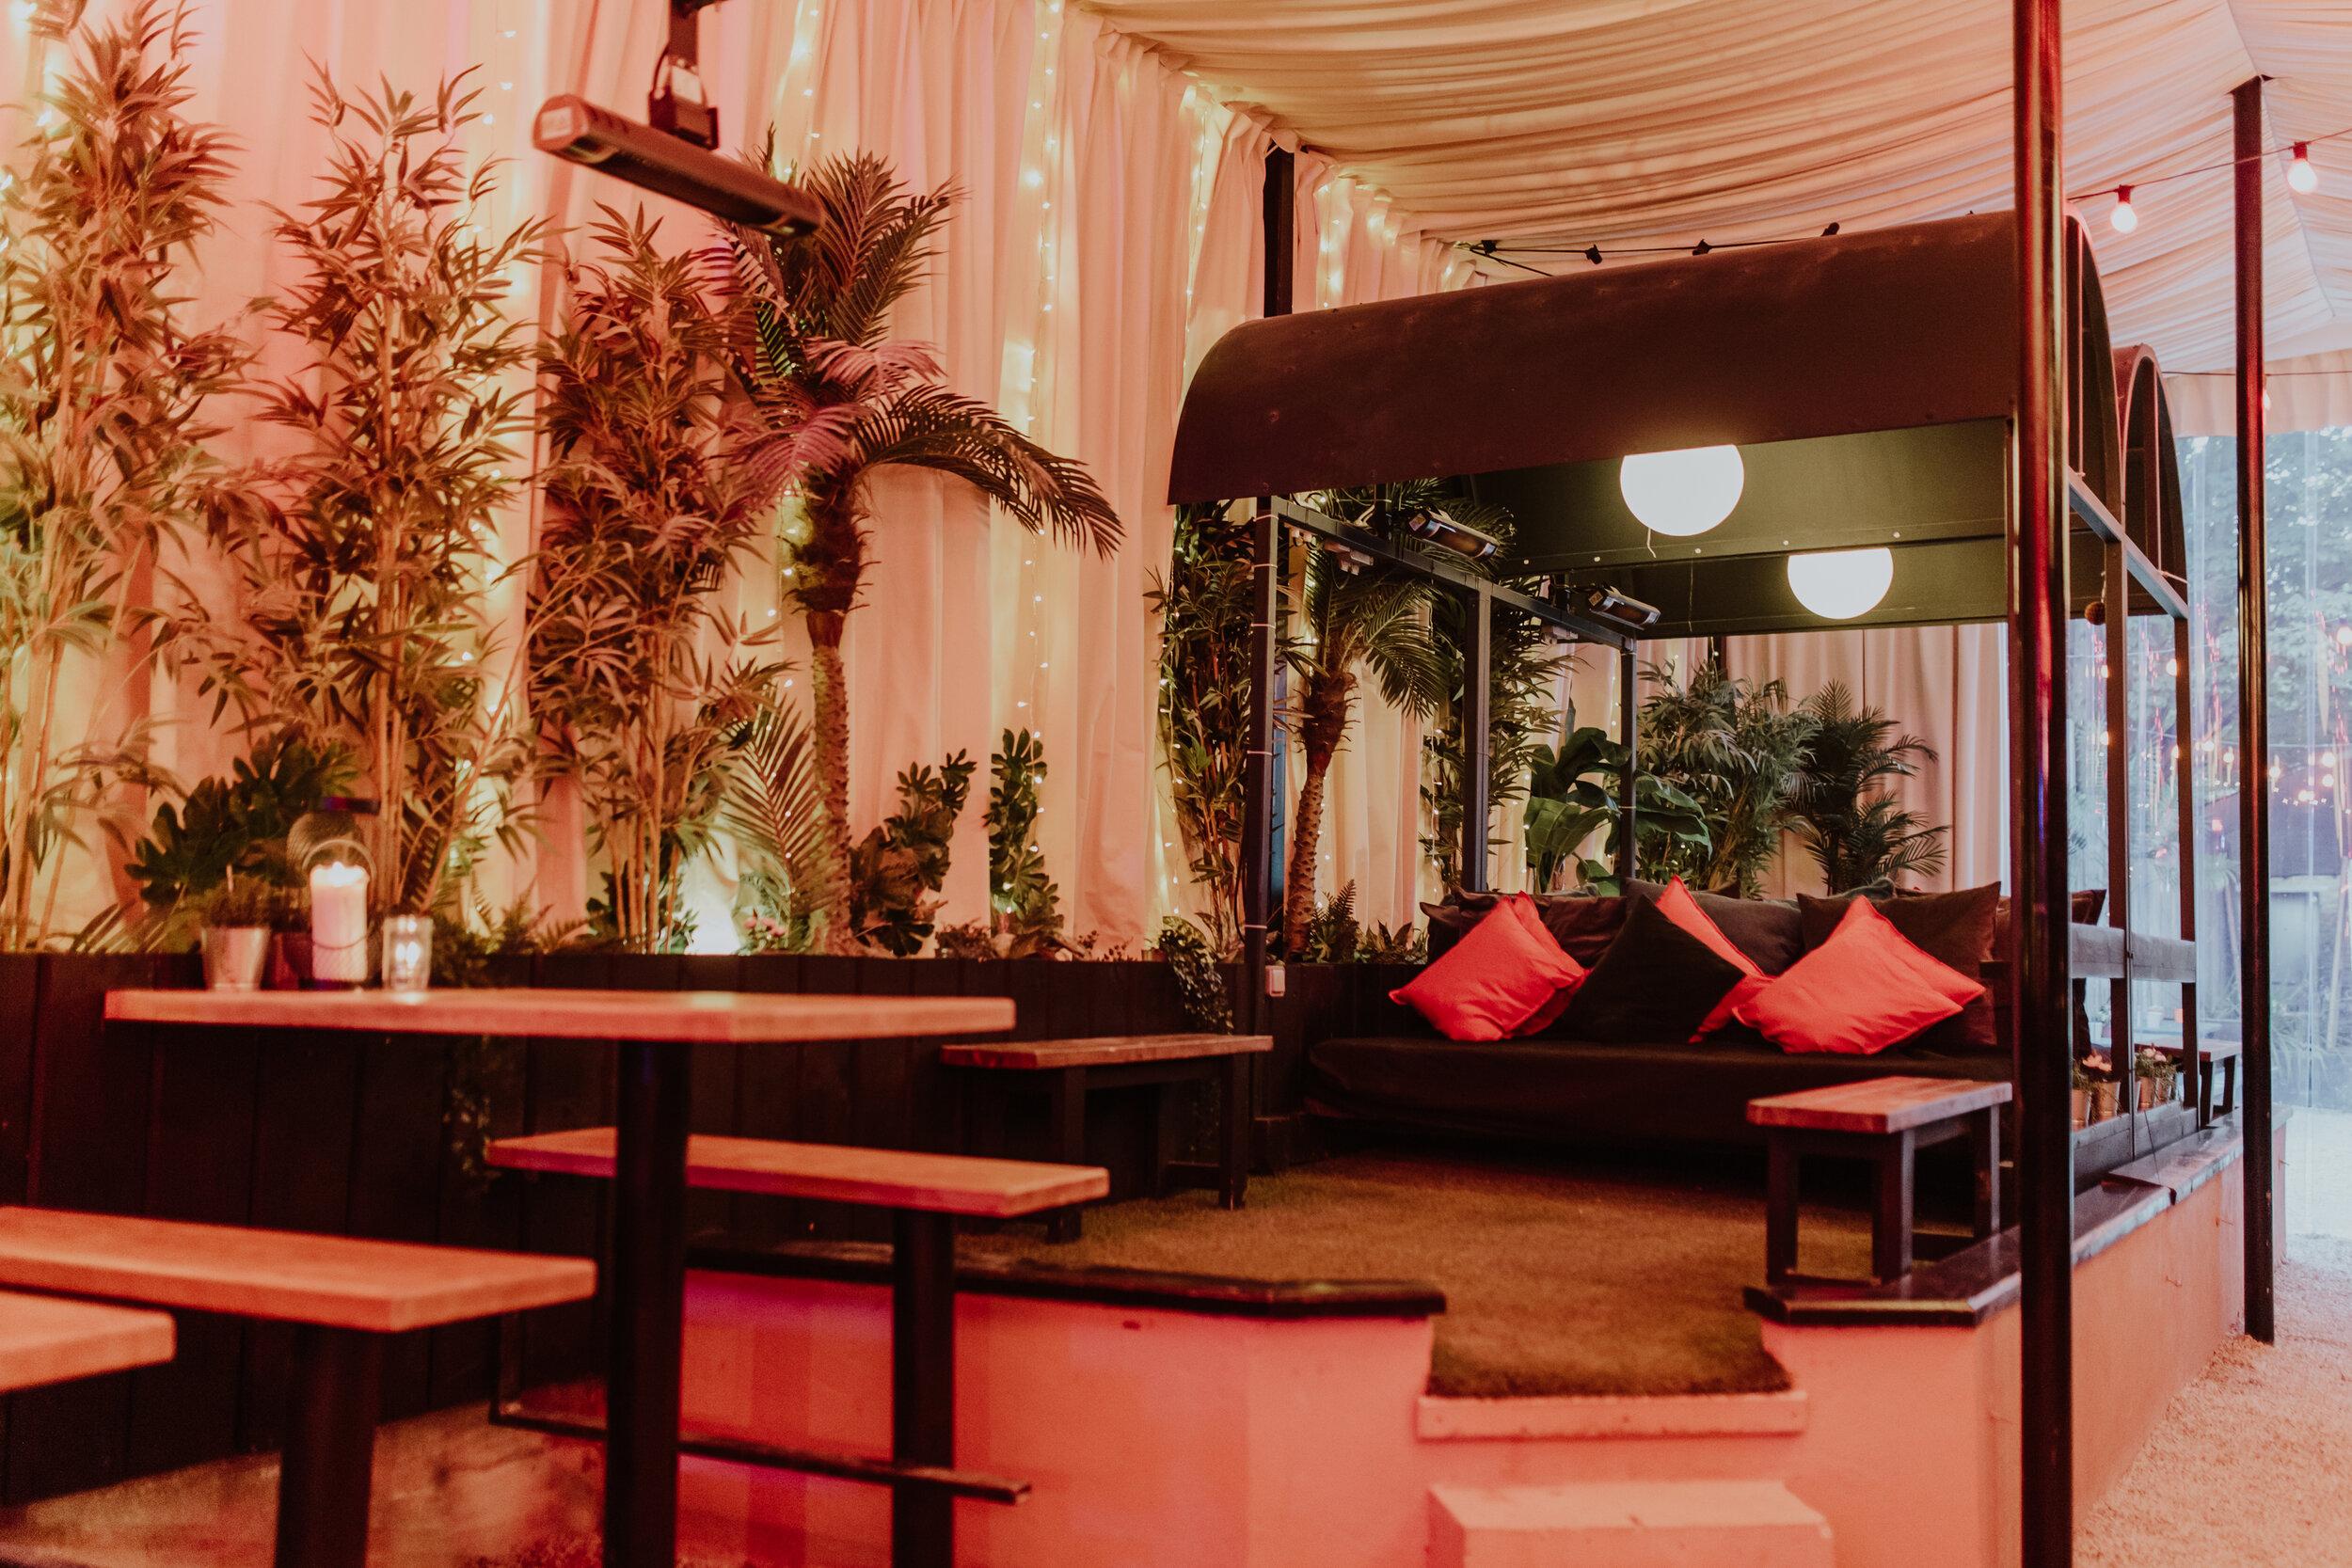 garden booth.jpg